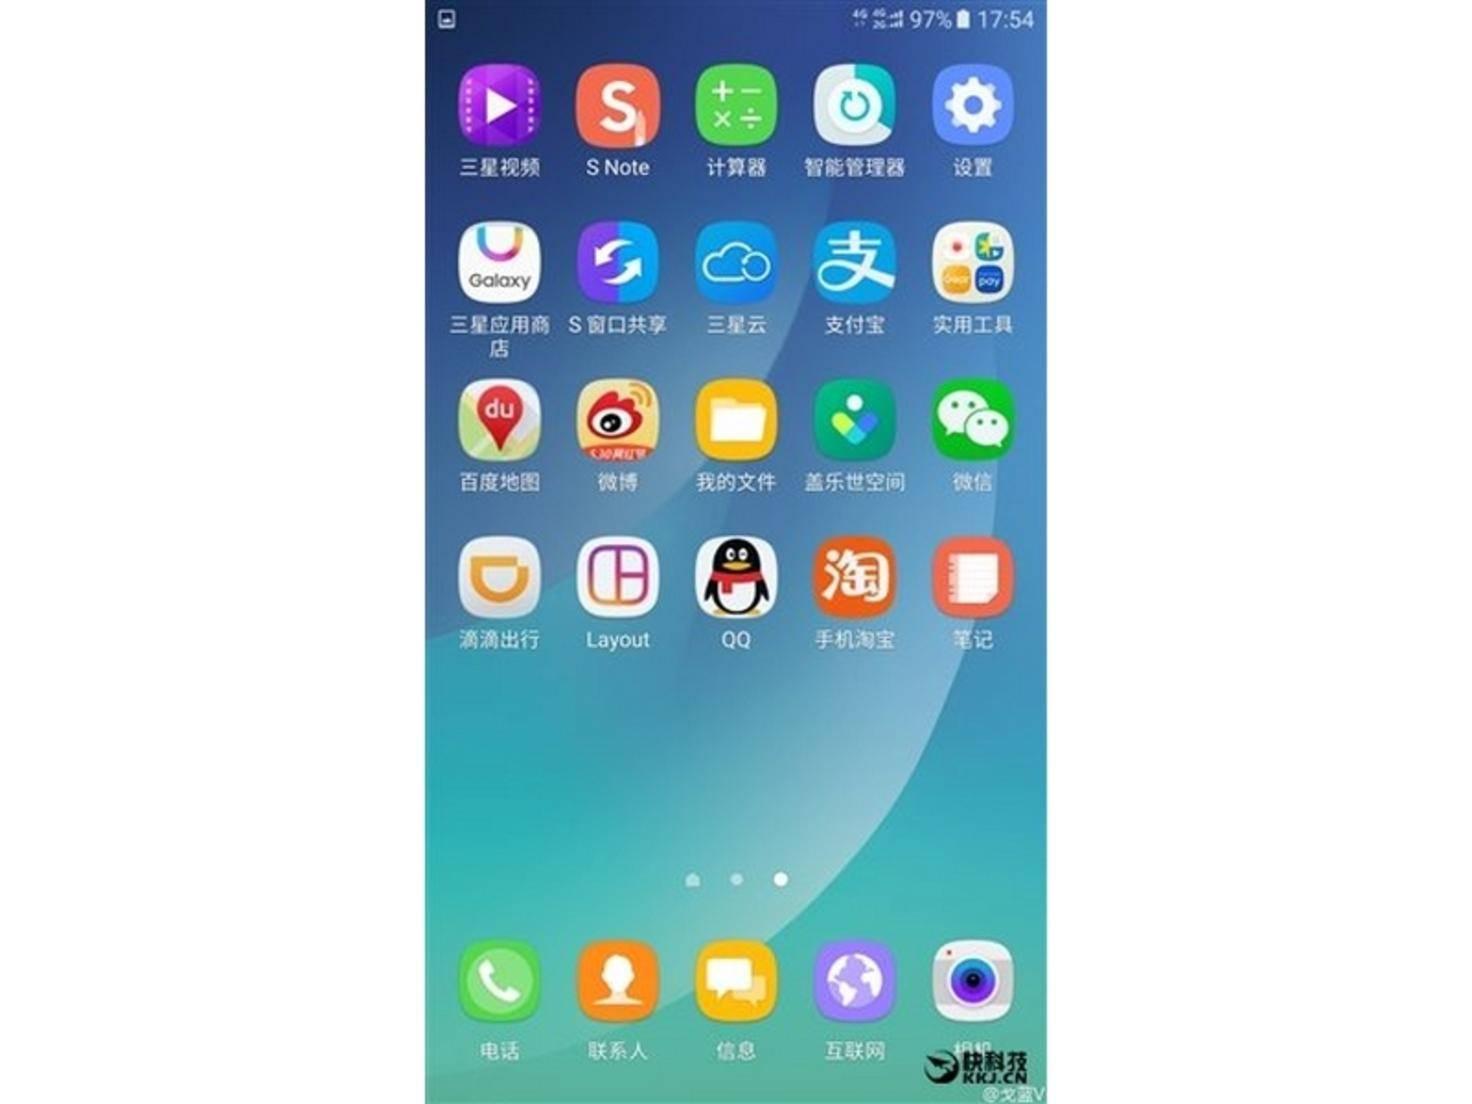 Apps landen direkt auf dem Homescreen.